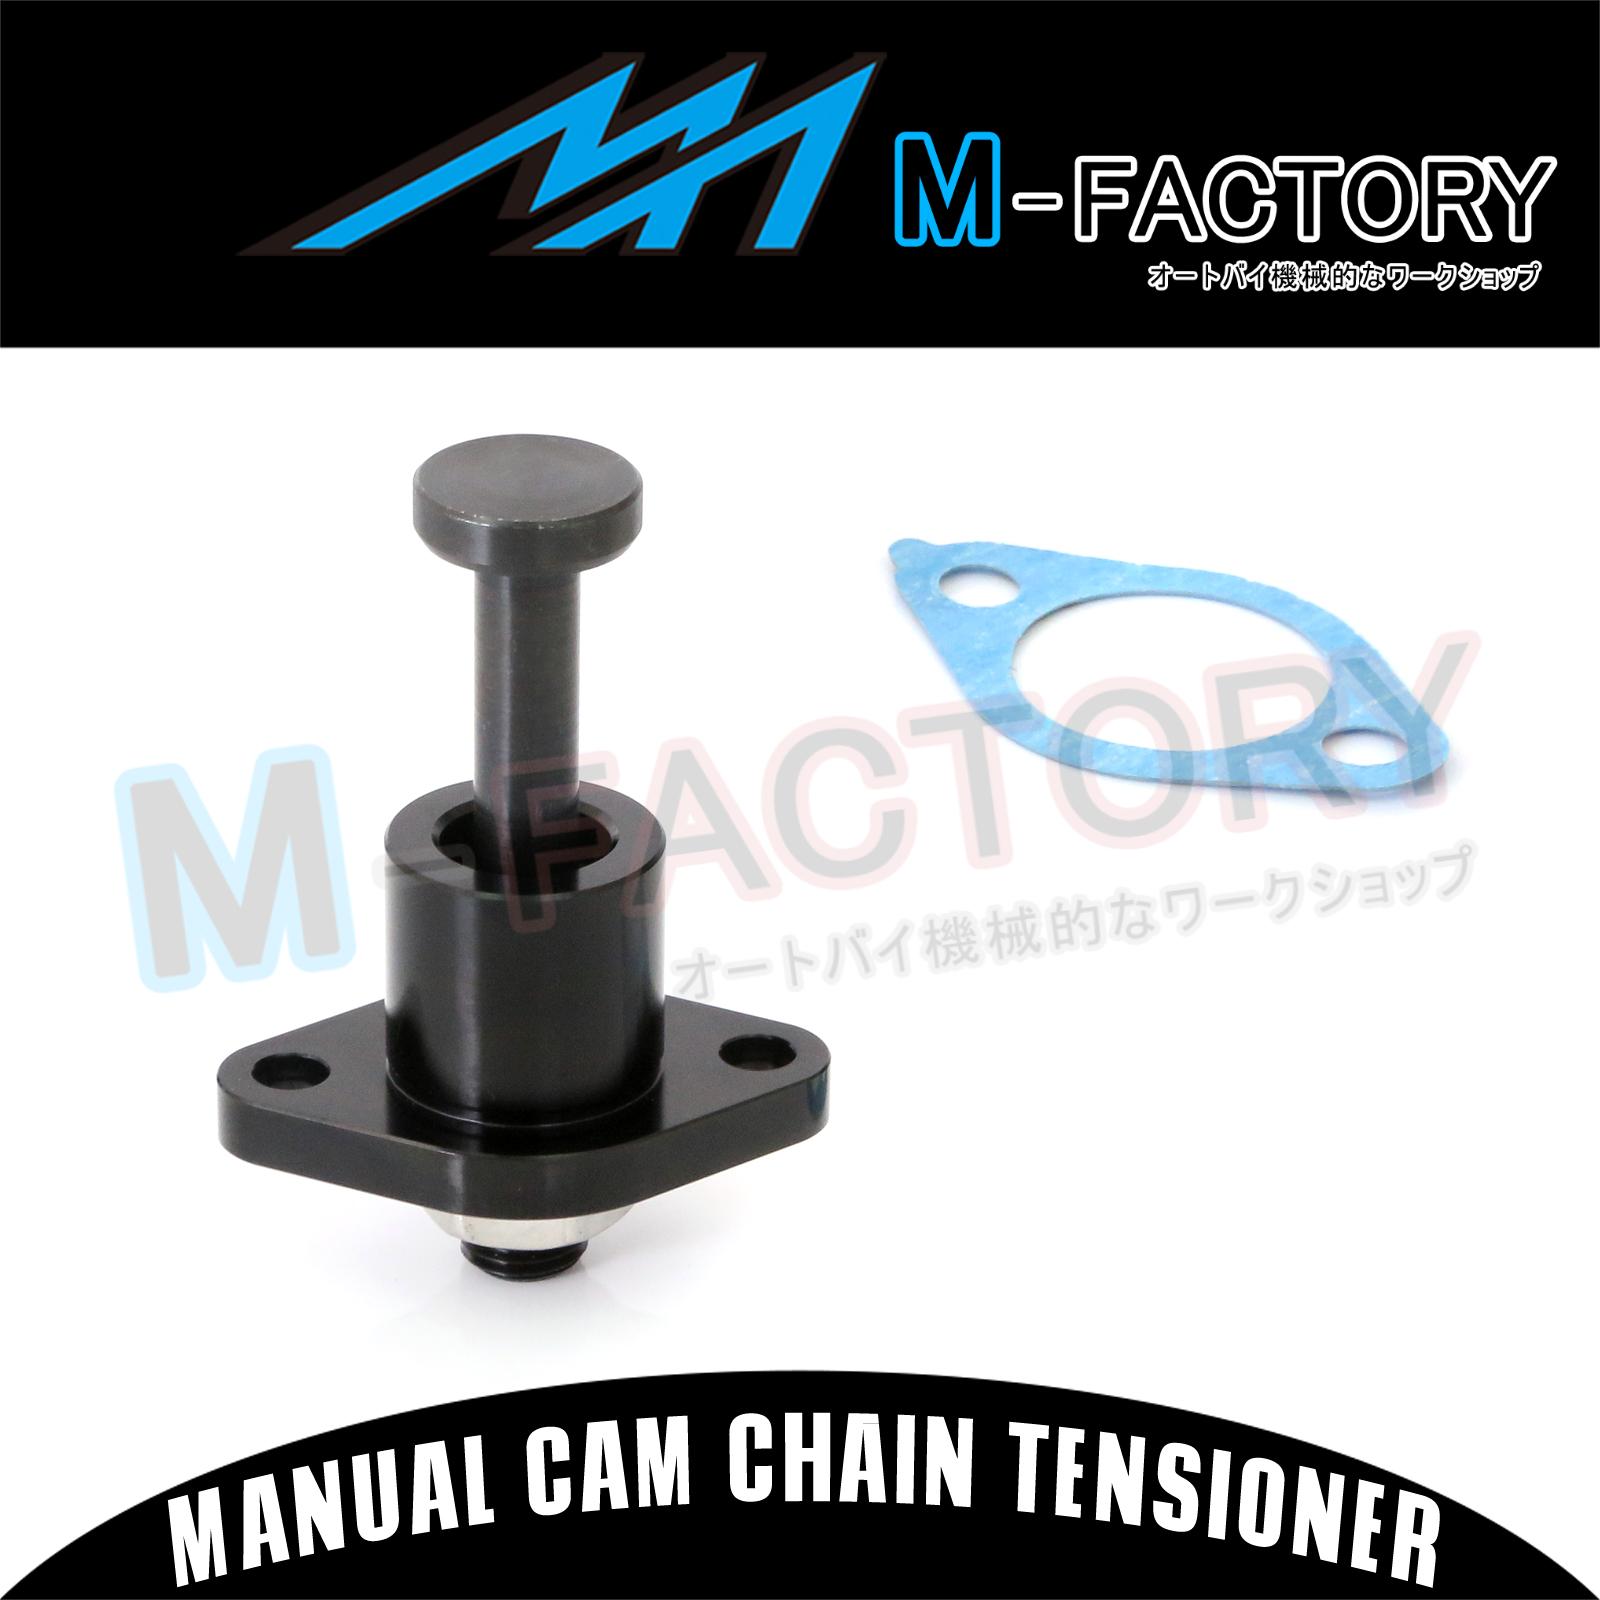 New Black Billet Manual Cam Chain Tensioner Fit Yamaha MT-09 14-17 14 15 16  17